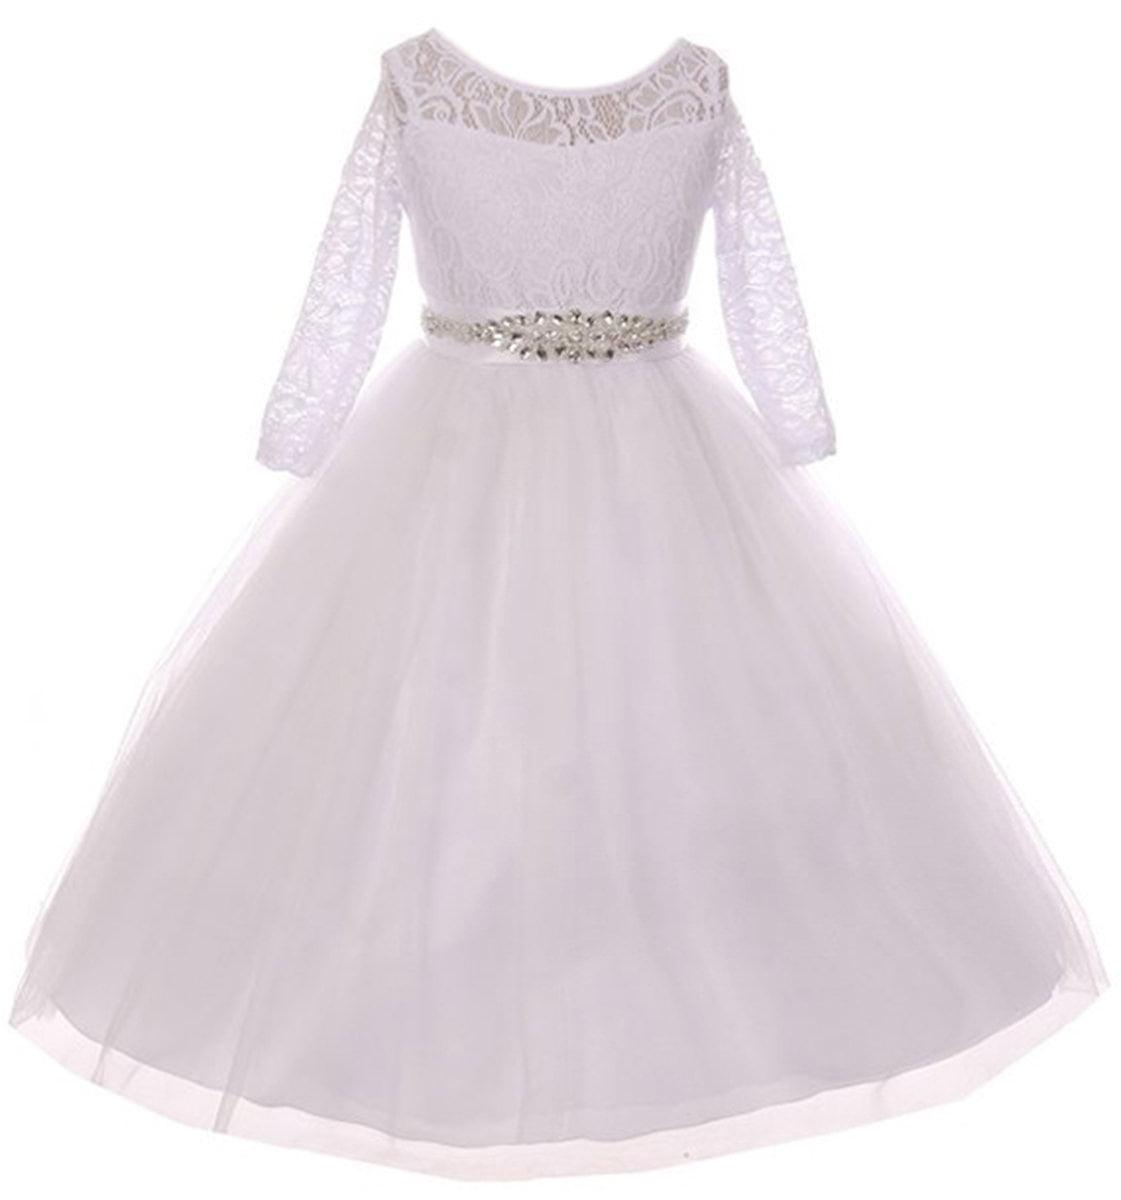 Little Girls Dress Lace Top Rhinestones Tulle Communion Party Flower Girl Dress...